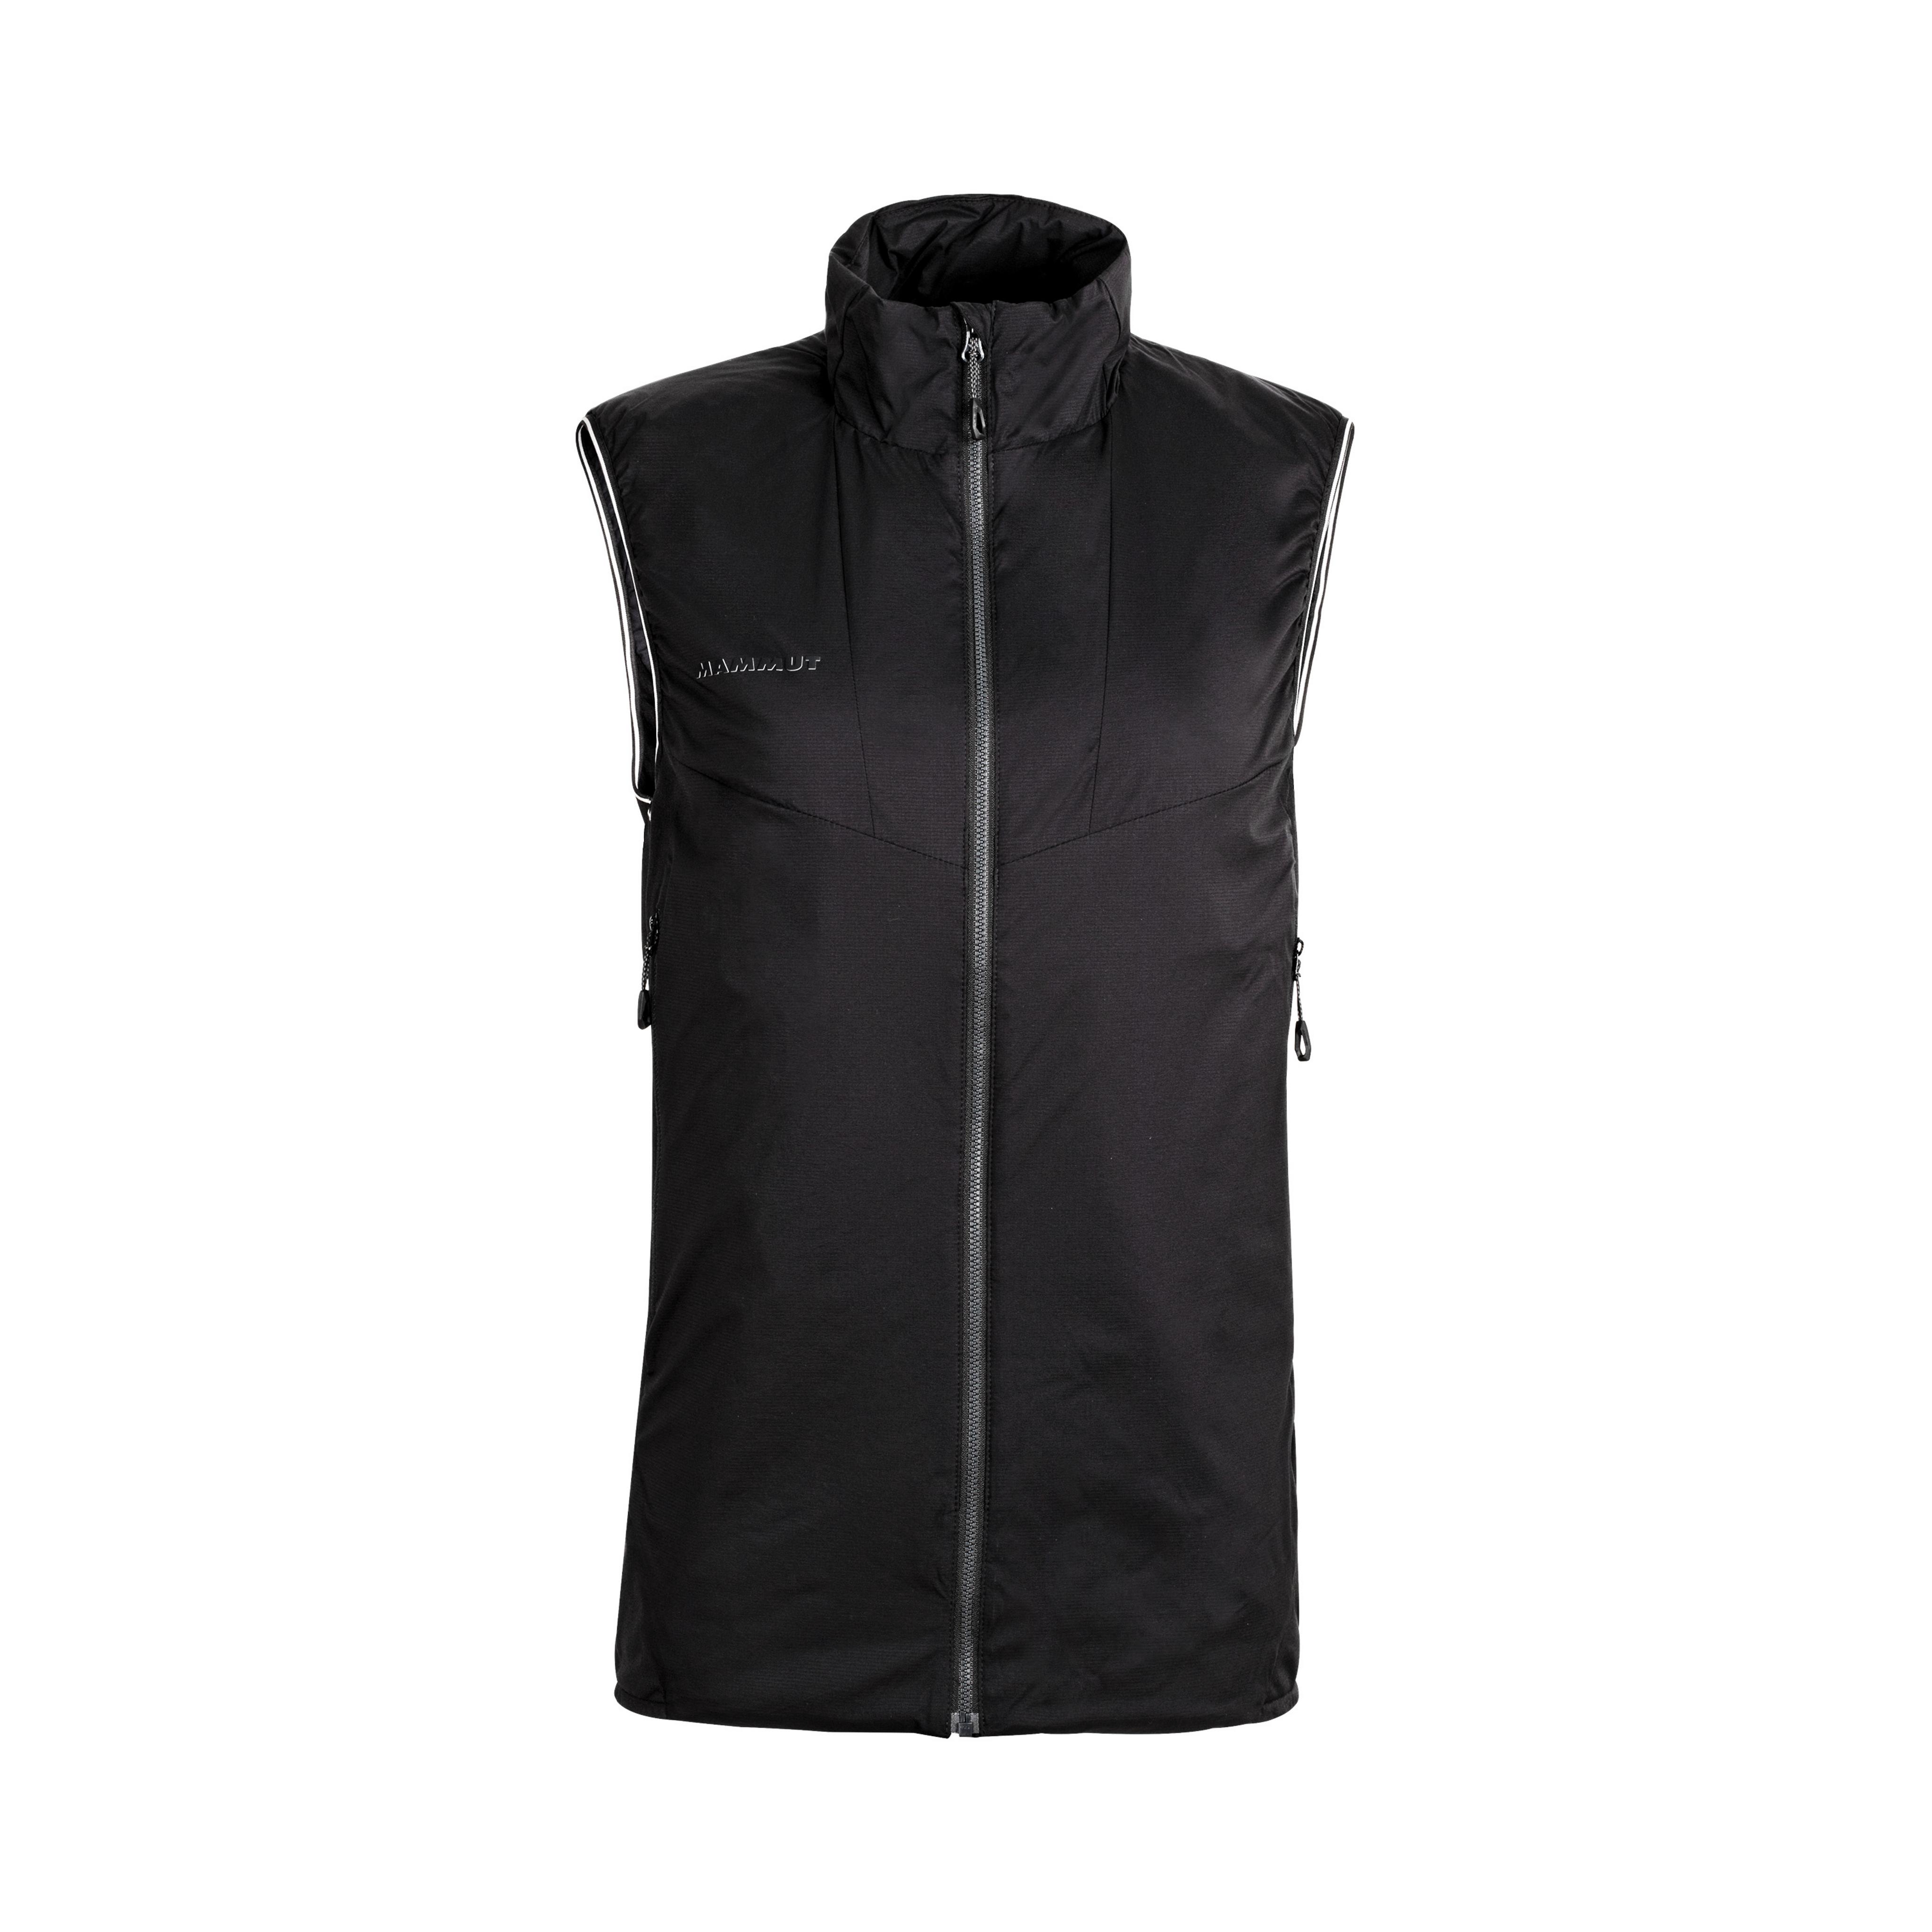 Rime Light In Flex Vest Men - black, XL thumbnail